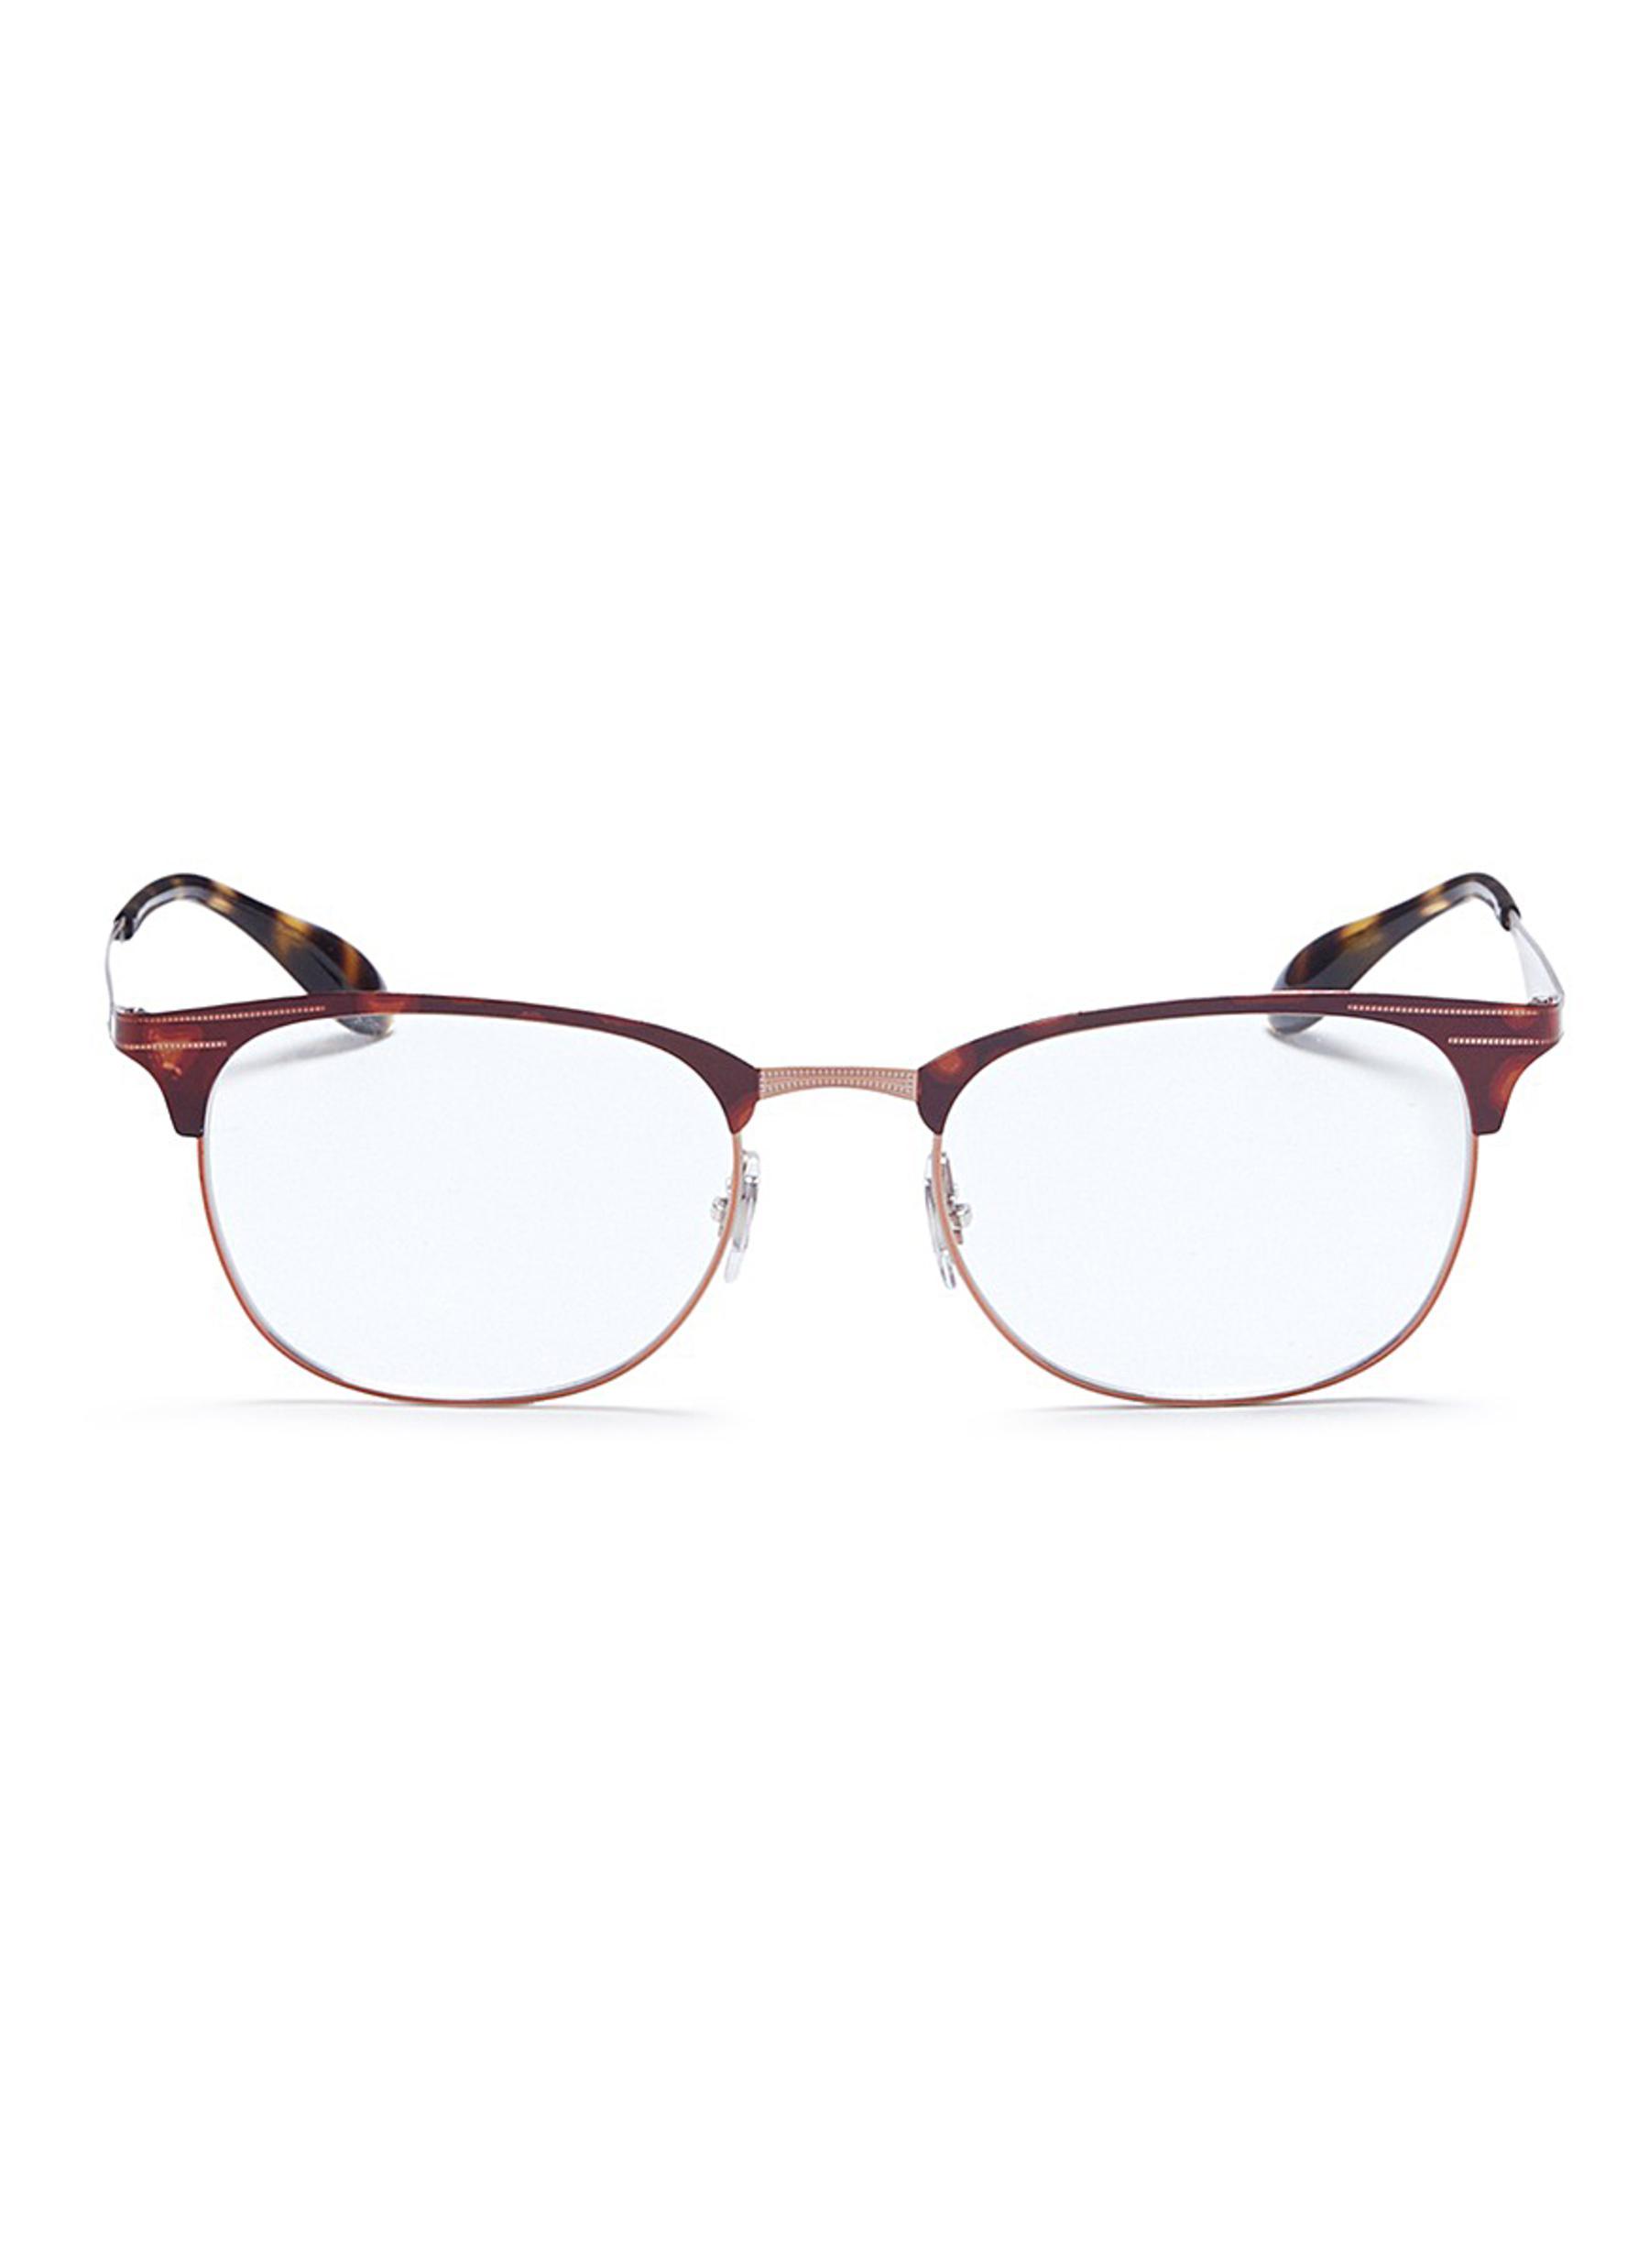 56167217ae Ray Ban  Rb6346  Tortoiseshell Metal Square Optical Glasses